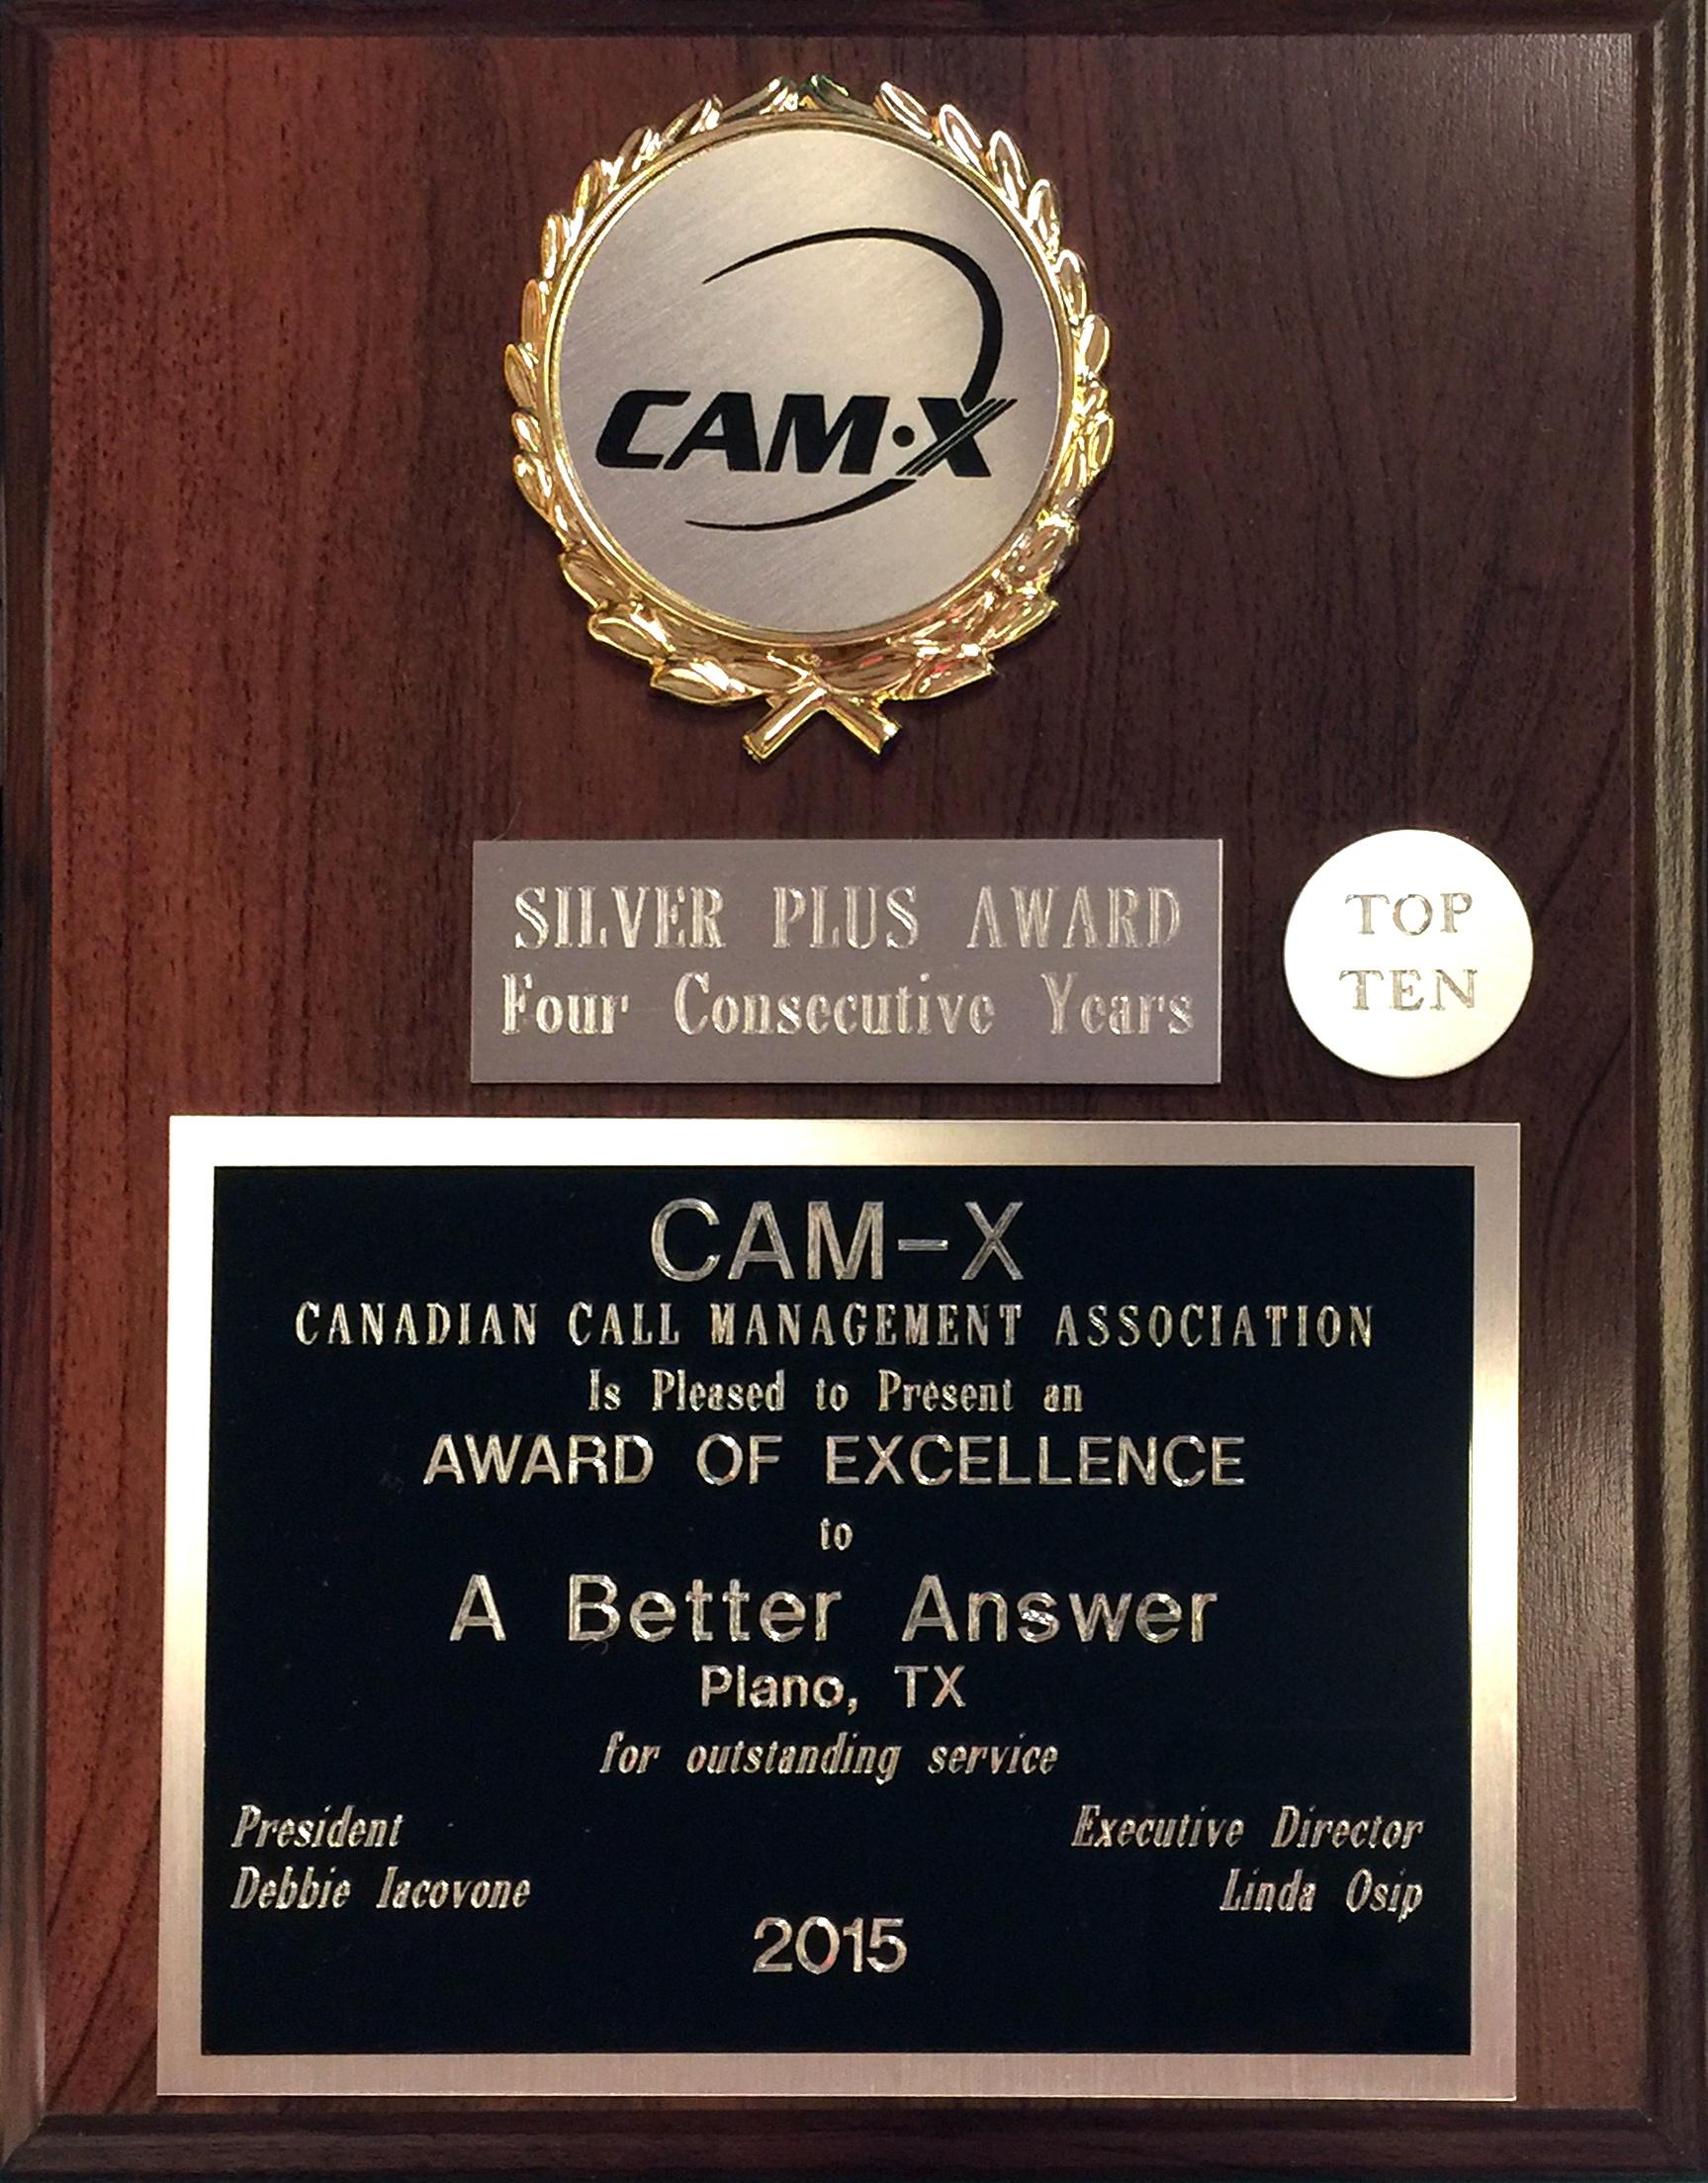 CAMX_Award_2015_-_Plano.jpg